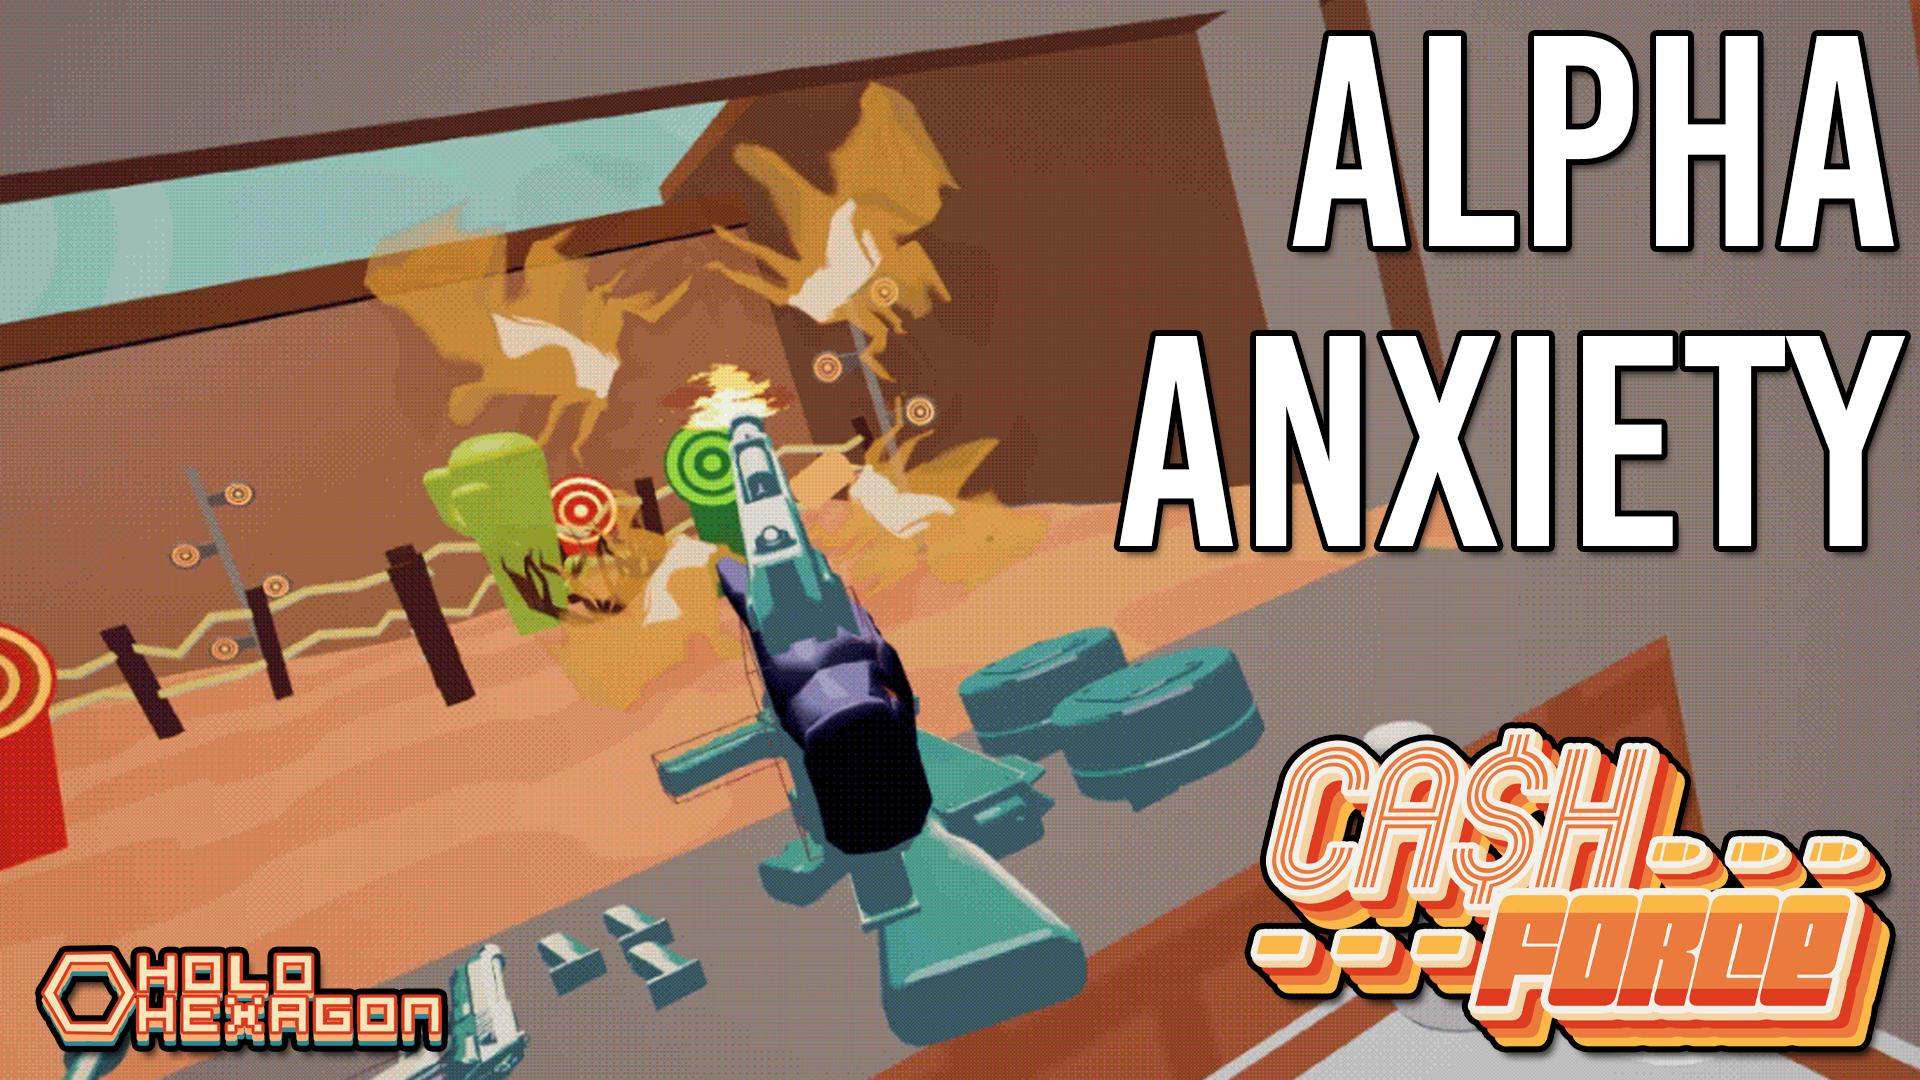 Development Blog #8: Alpha Anxiety